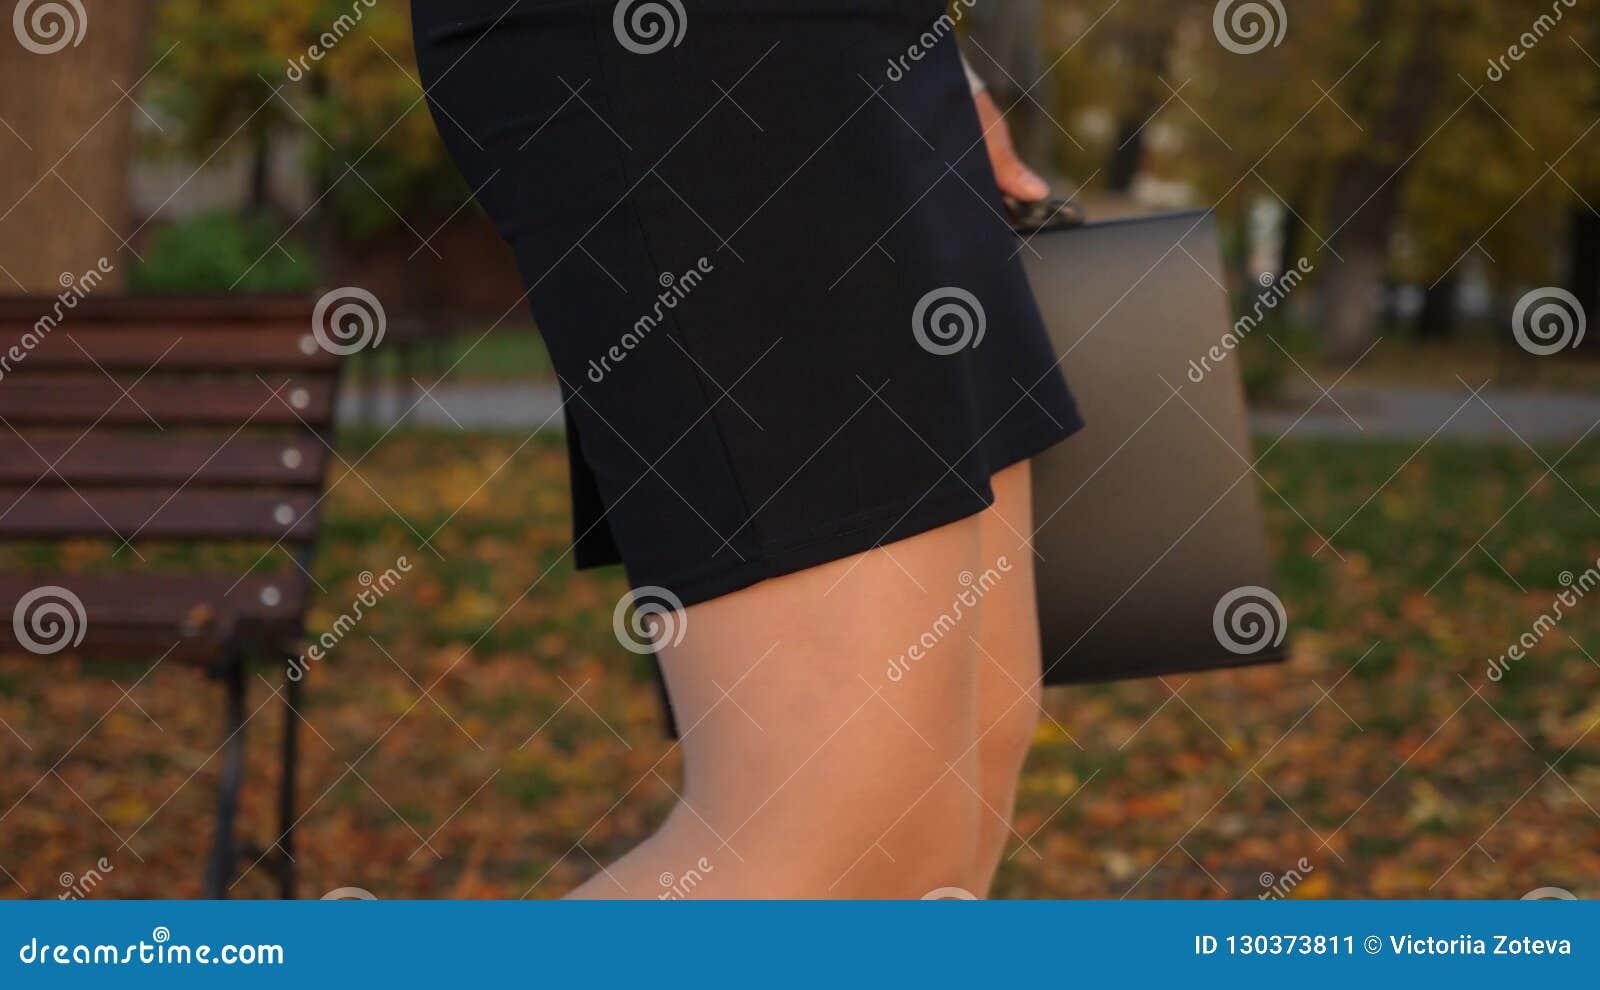 Very useful hands between legs pantyhose